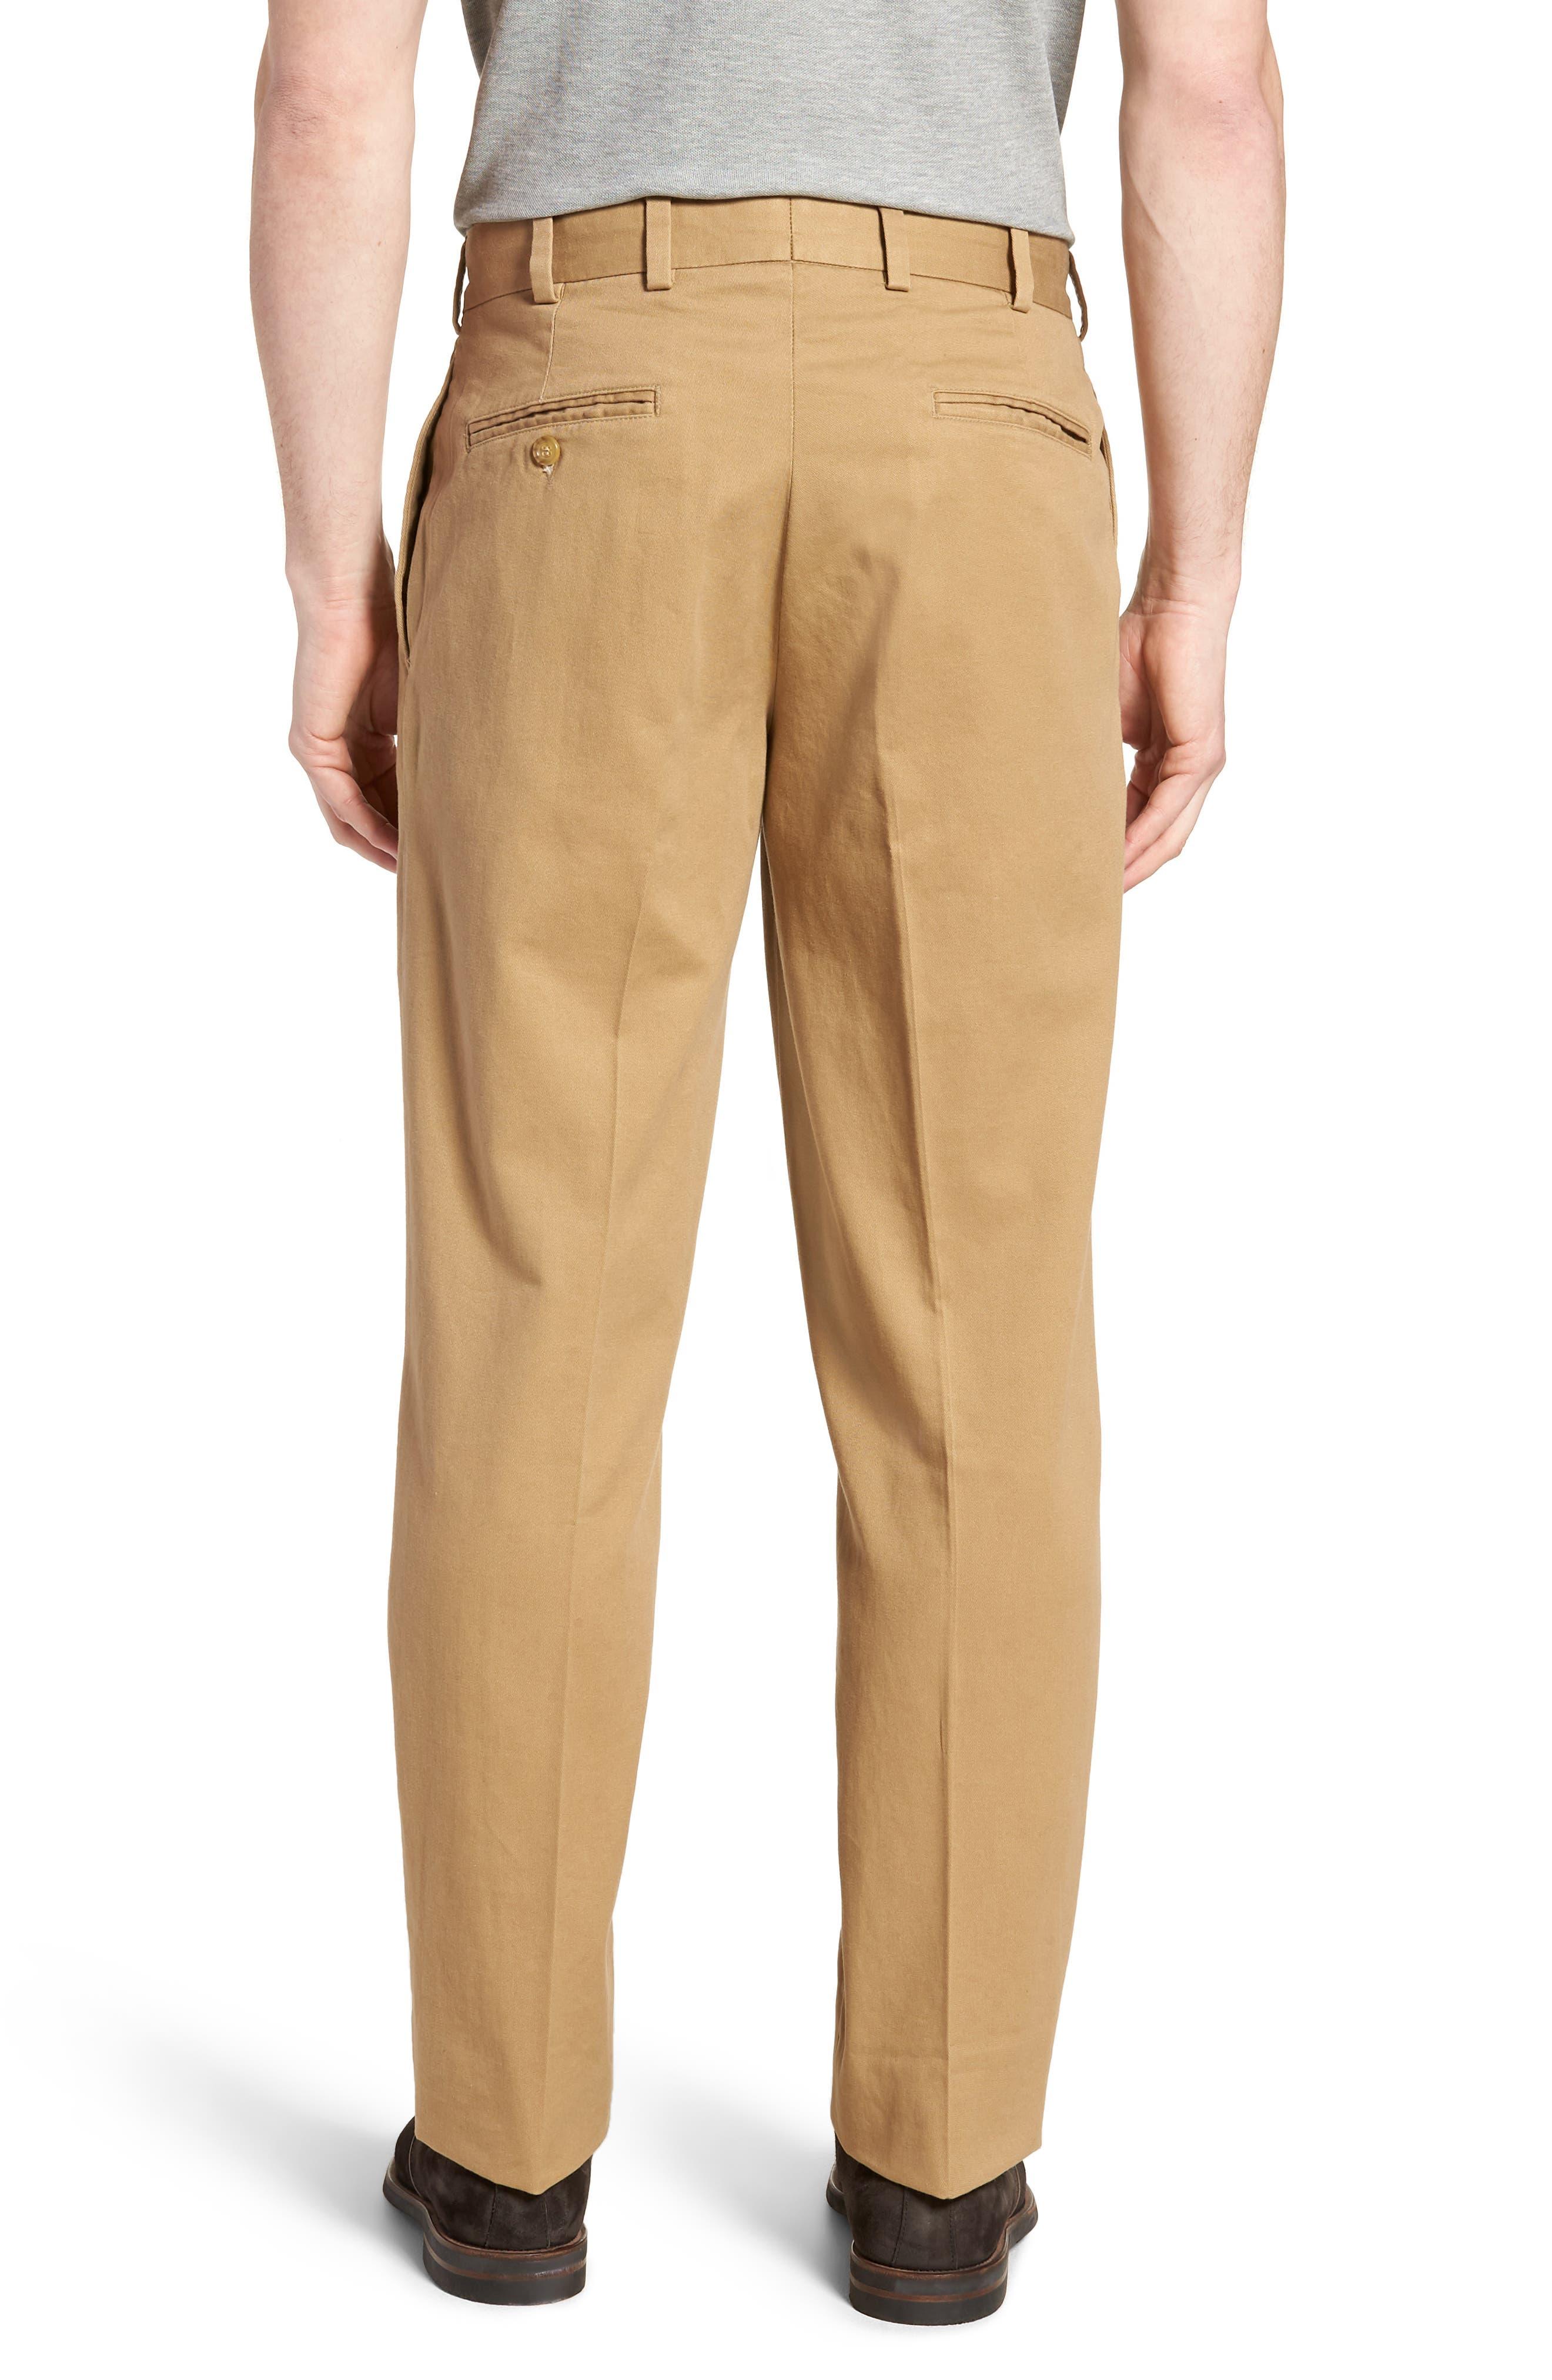 M2 Classic Fit Pleated Vintage Twill Pants,                             Alternate thumbnail 2, color,                             British Khaki